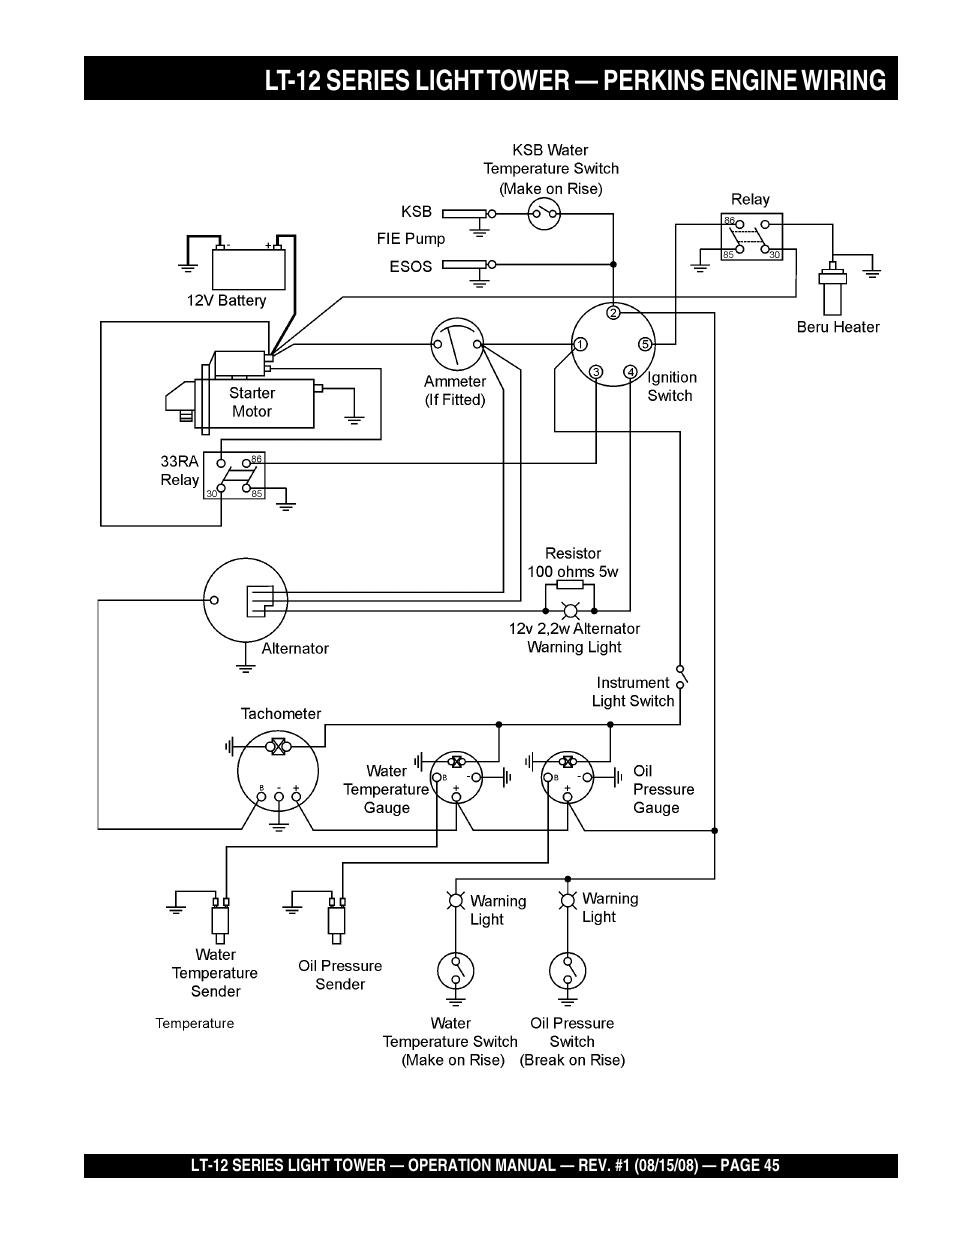 hight resolution of lt 12 series light tower perkins engine wiring stow nighthawk dedicated light tower